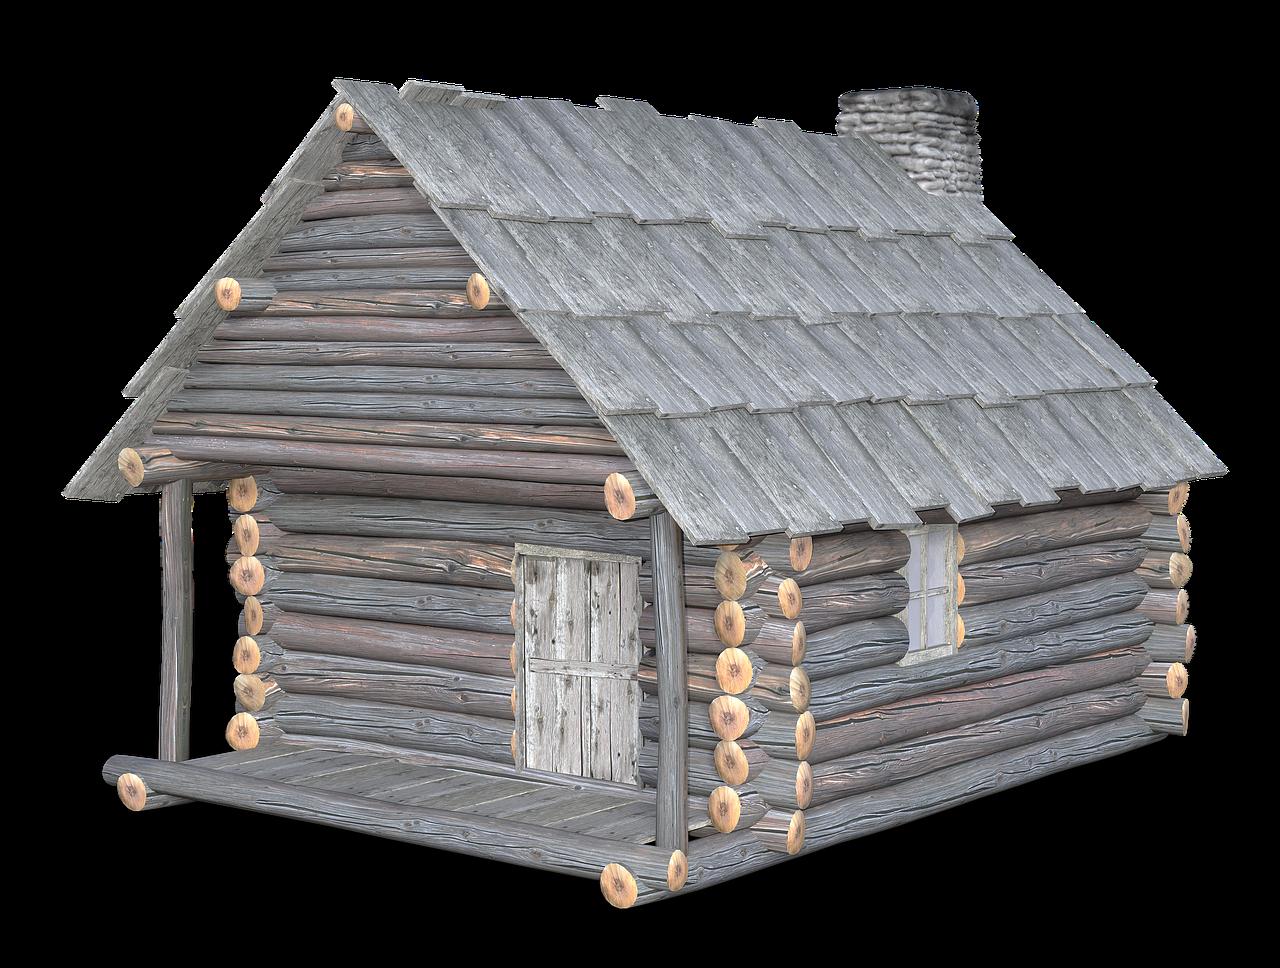 Block House Hut Alpine Hut  - anaterate / Pixabay